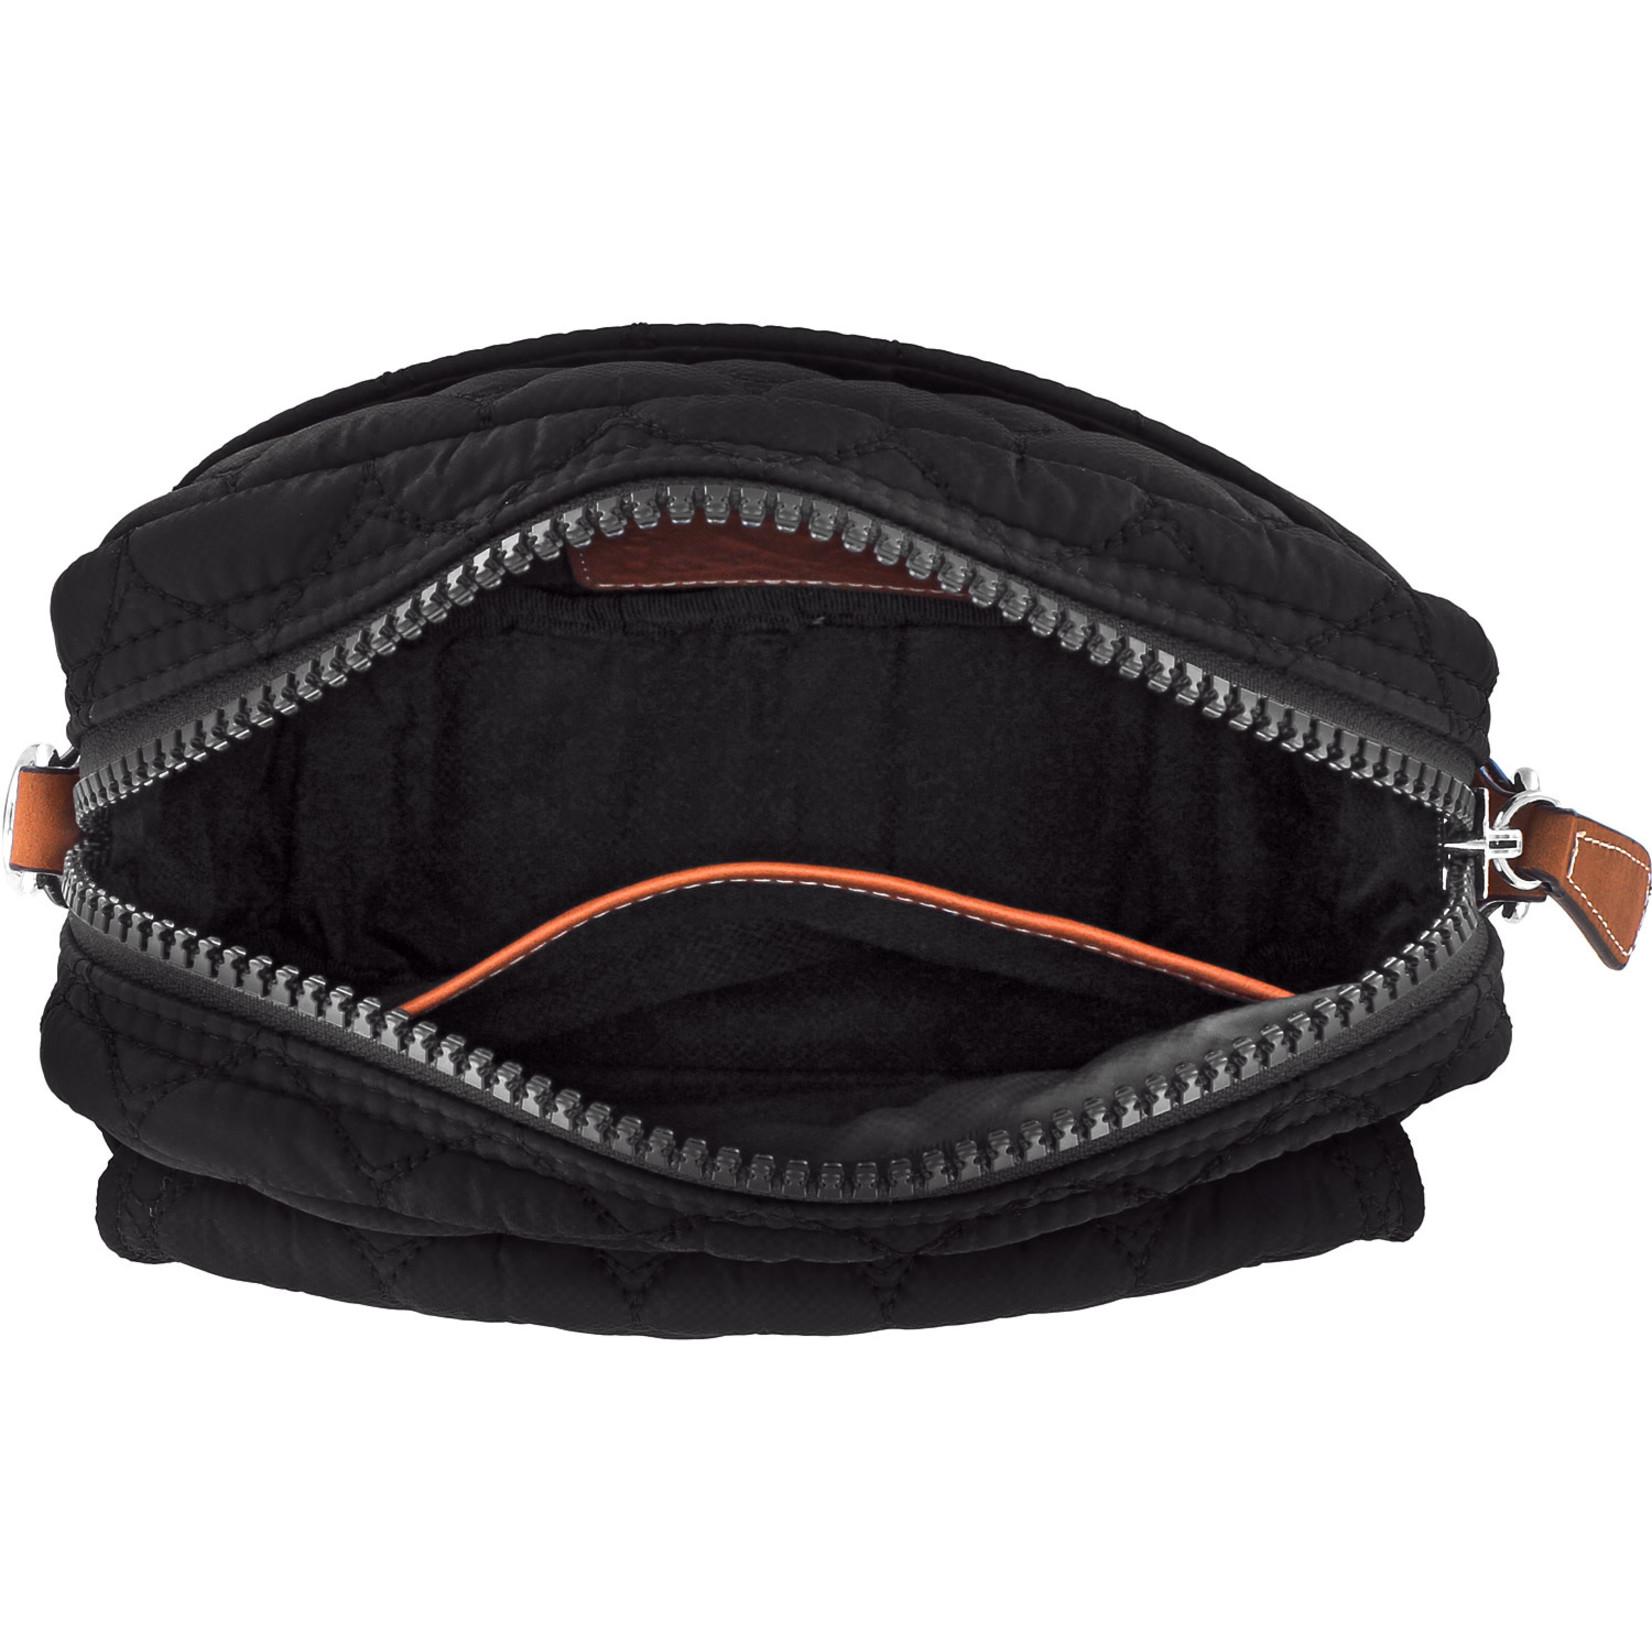 Brighton Knix Utility Bag Black